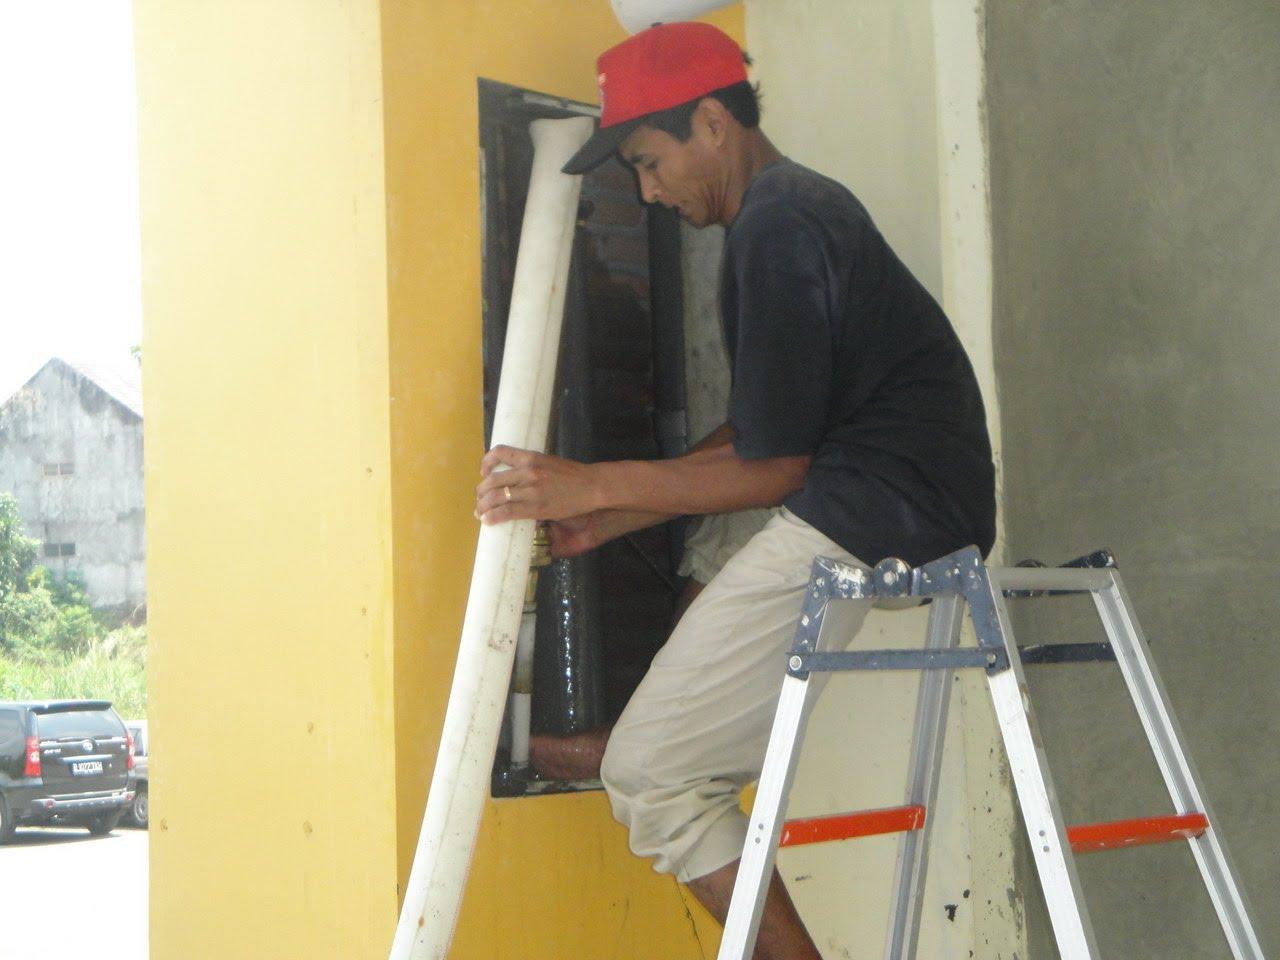 rusunawa sleman : perbaikan saluran wc penghuni yang tersumbat